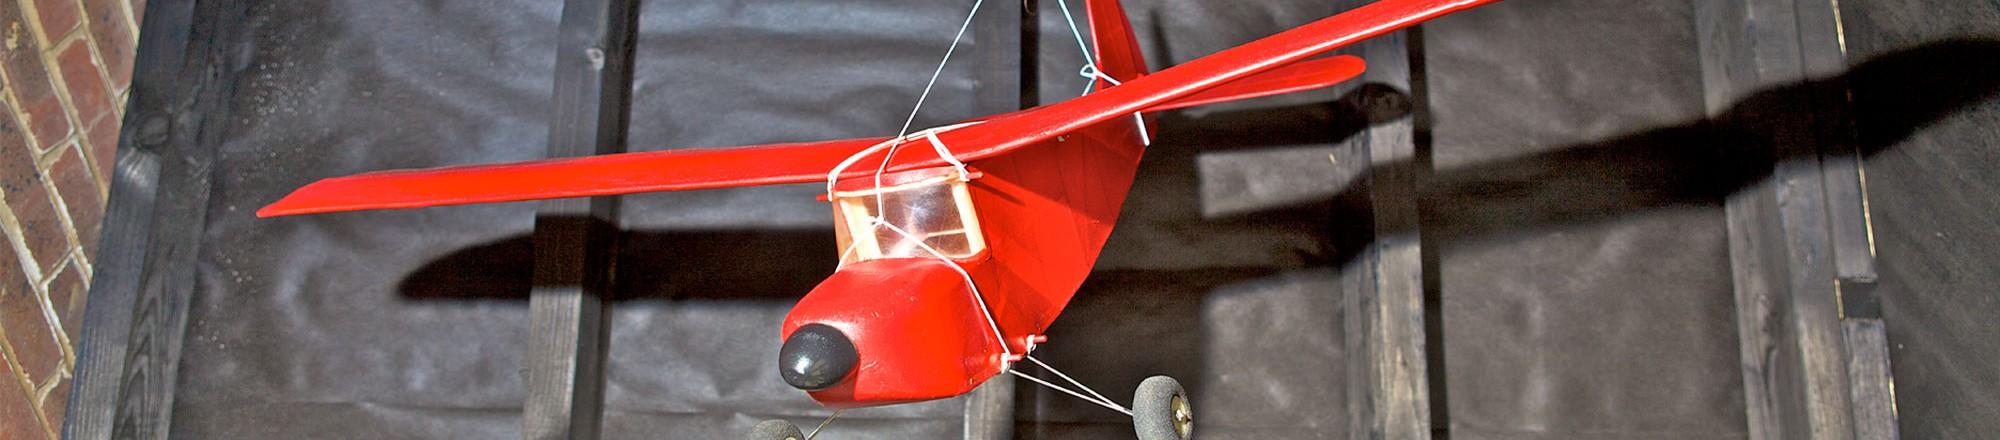 red-plane-bg